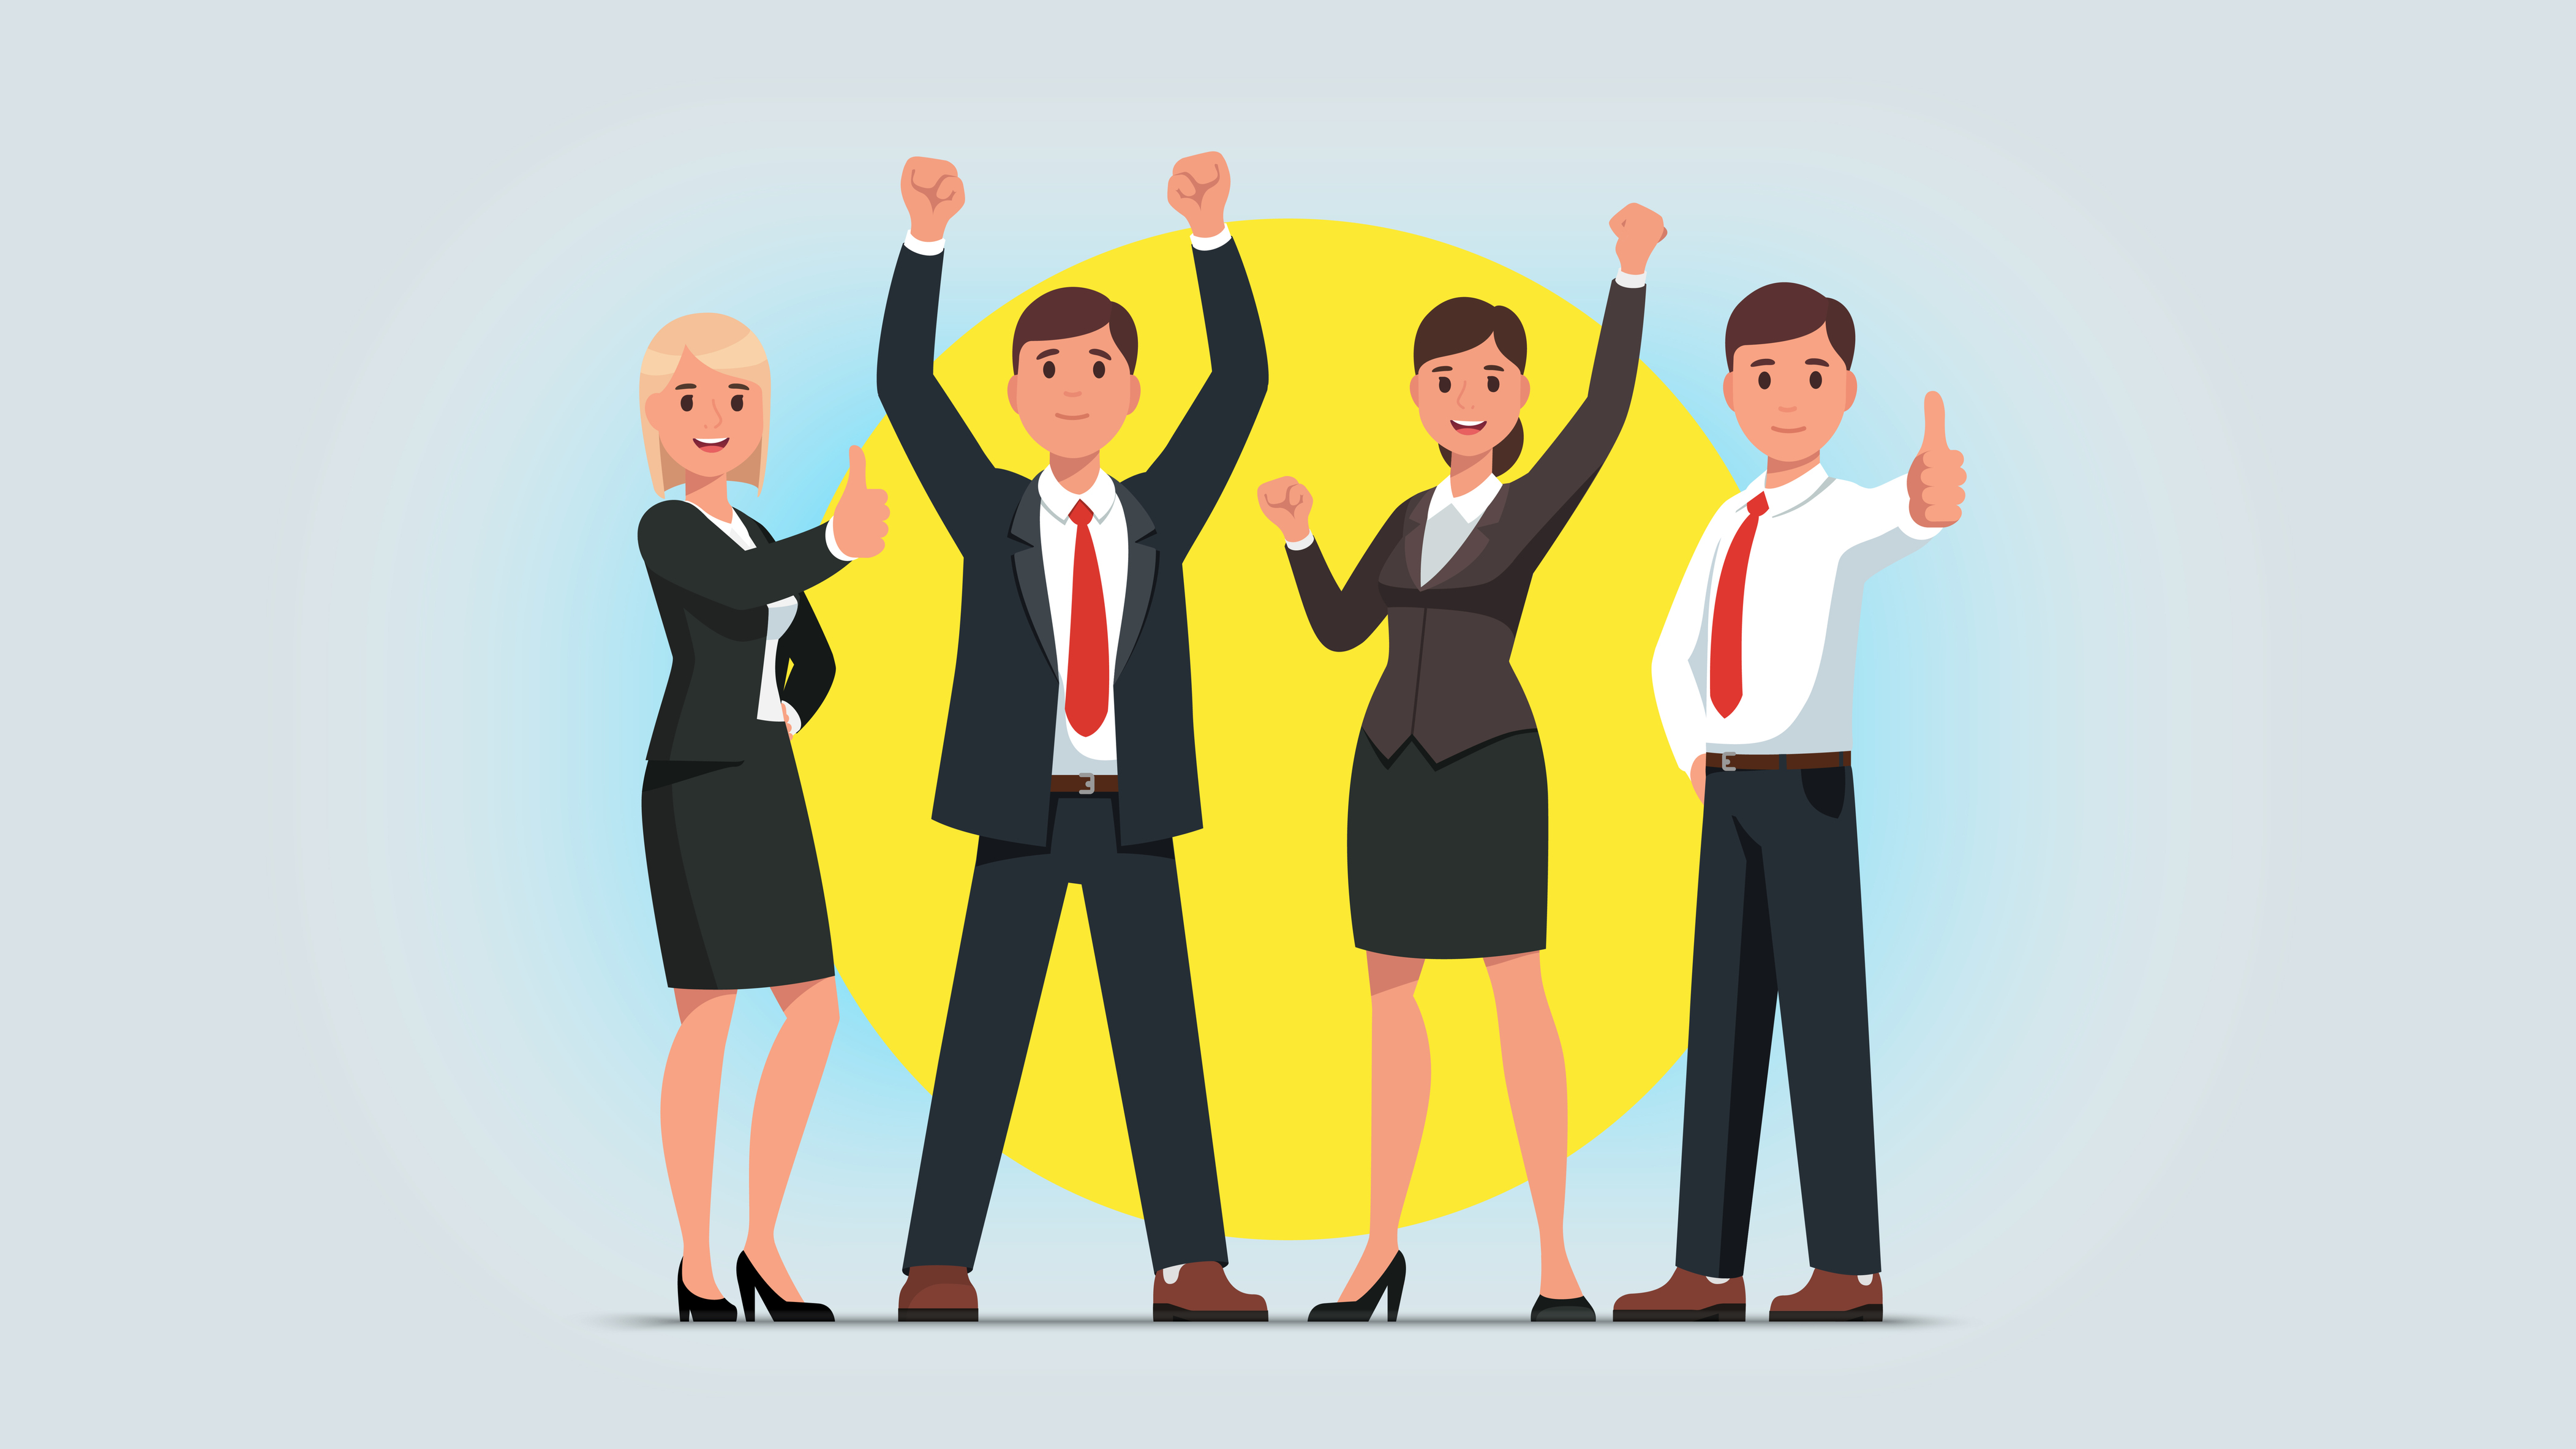 10 Employee Appreciation Ideas Your Staff Will Love